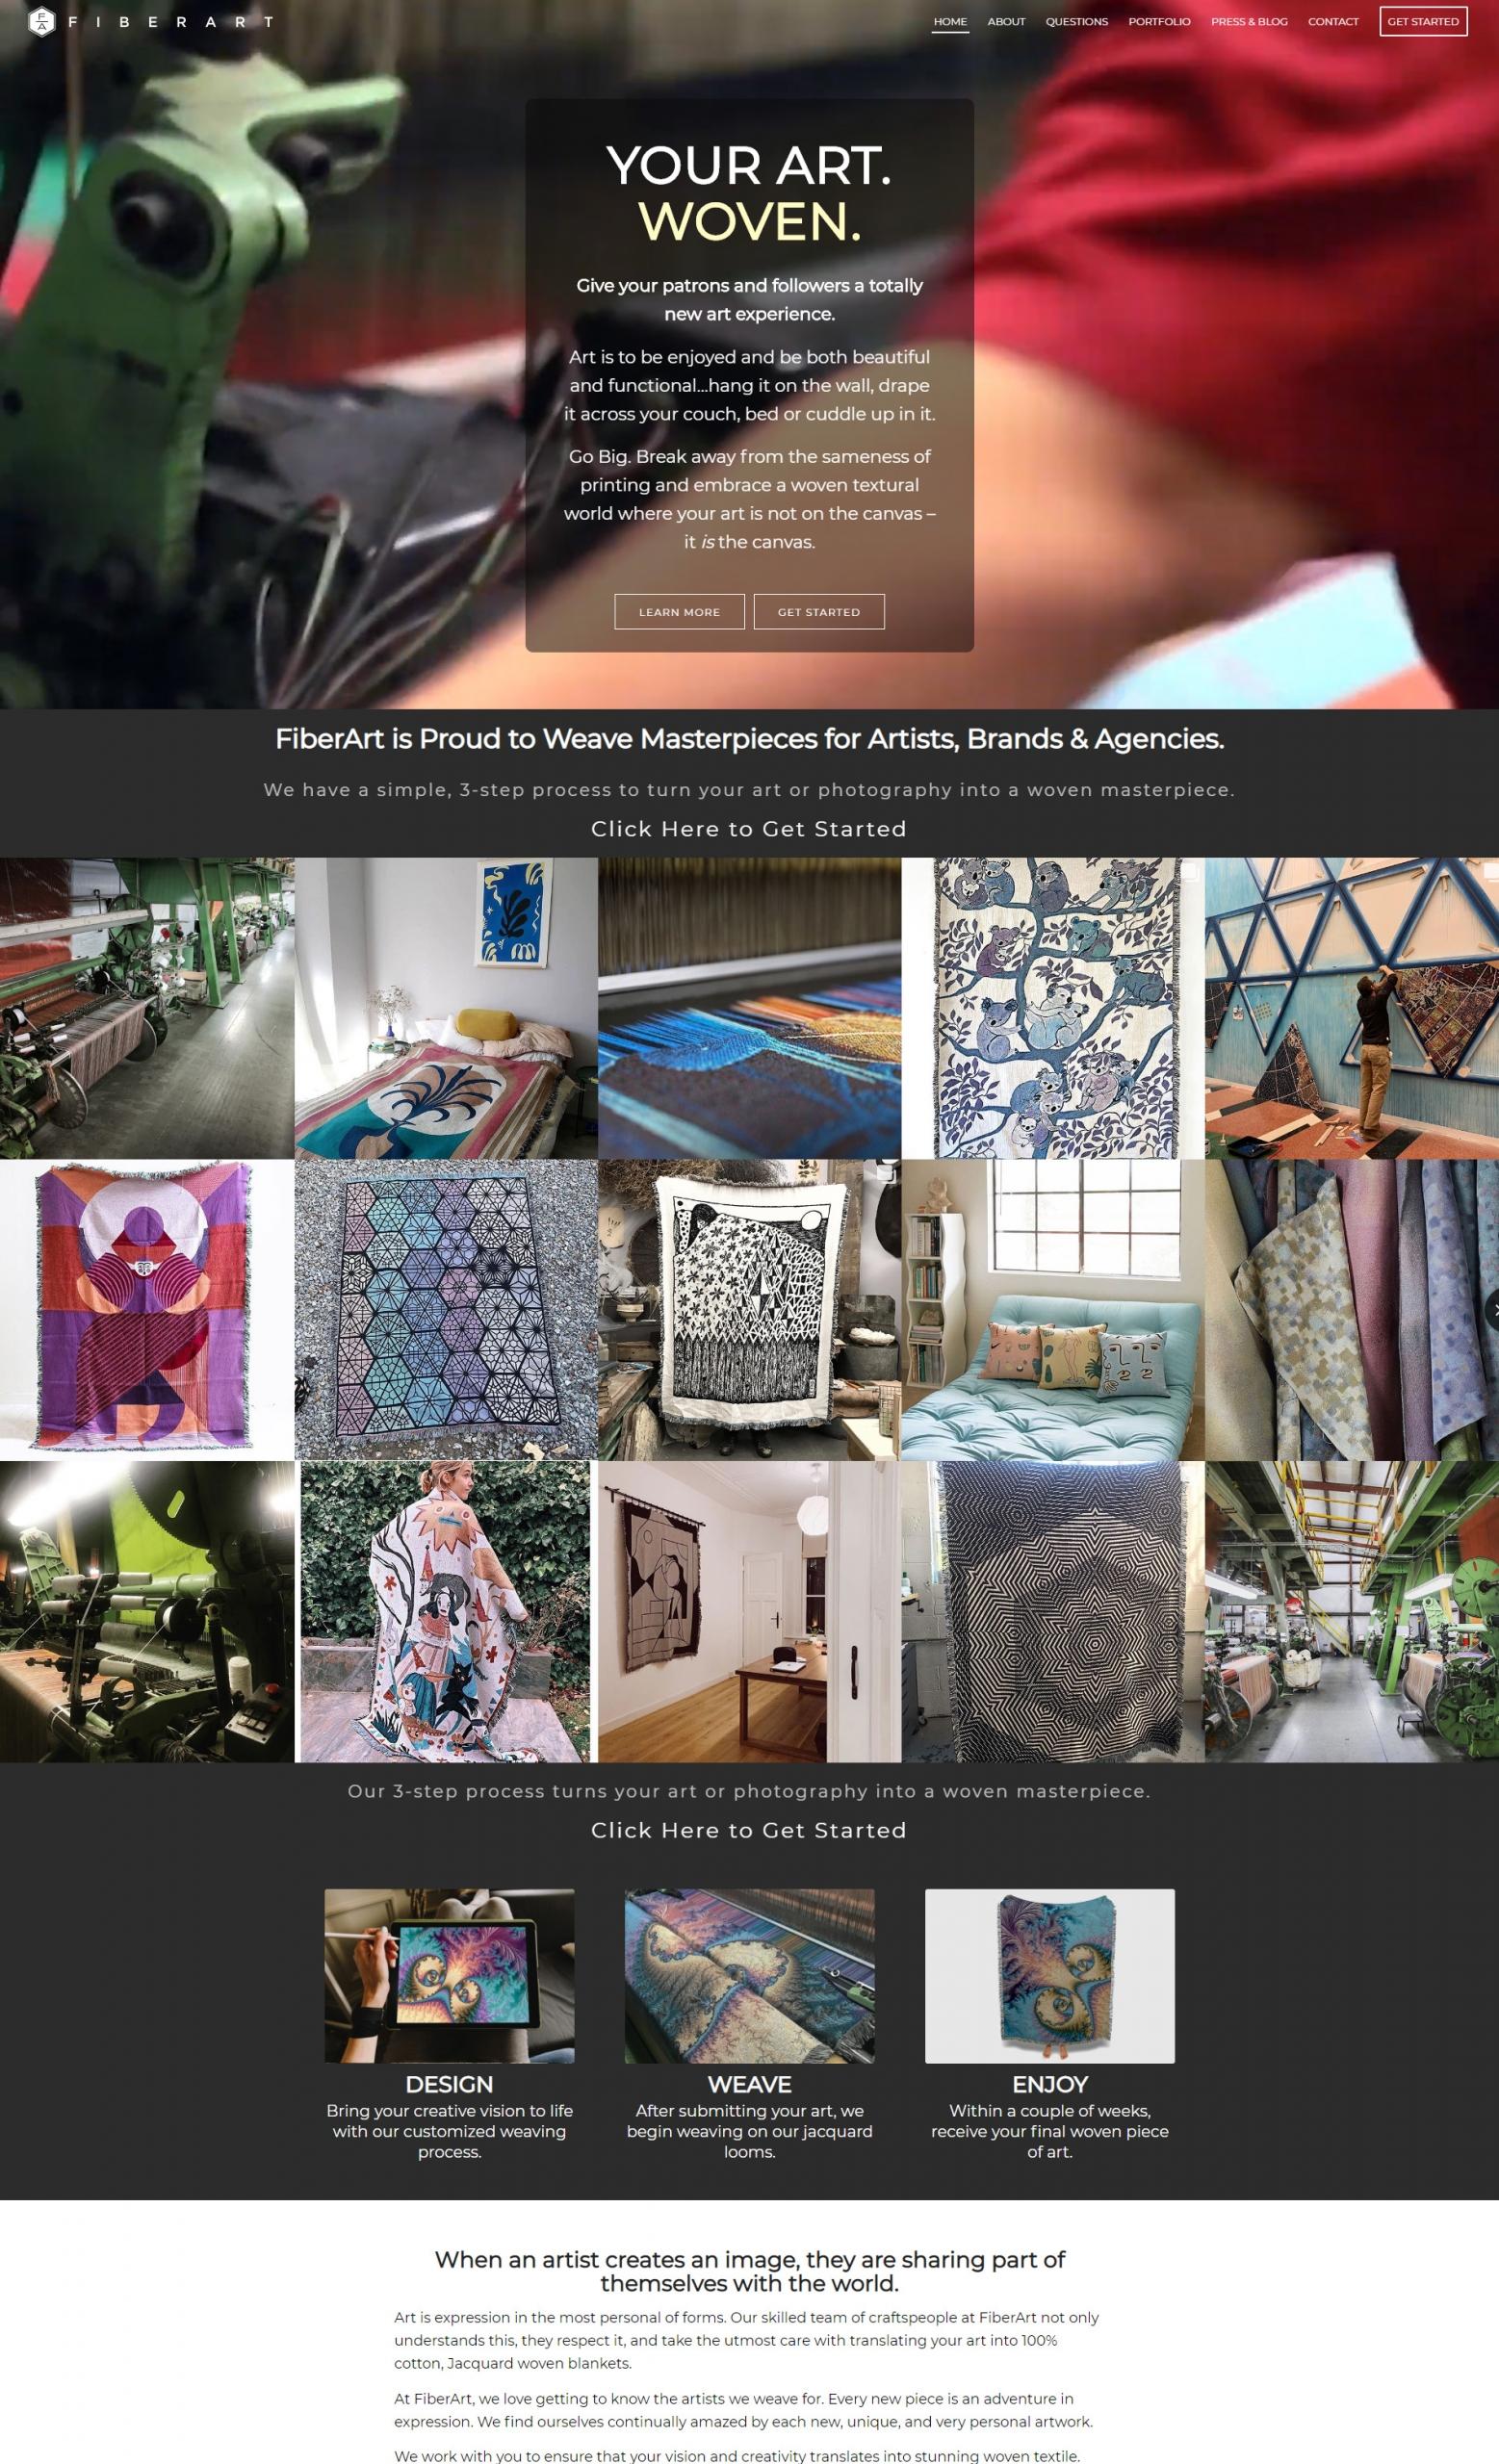 Website Design - After - FiberArt.com